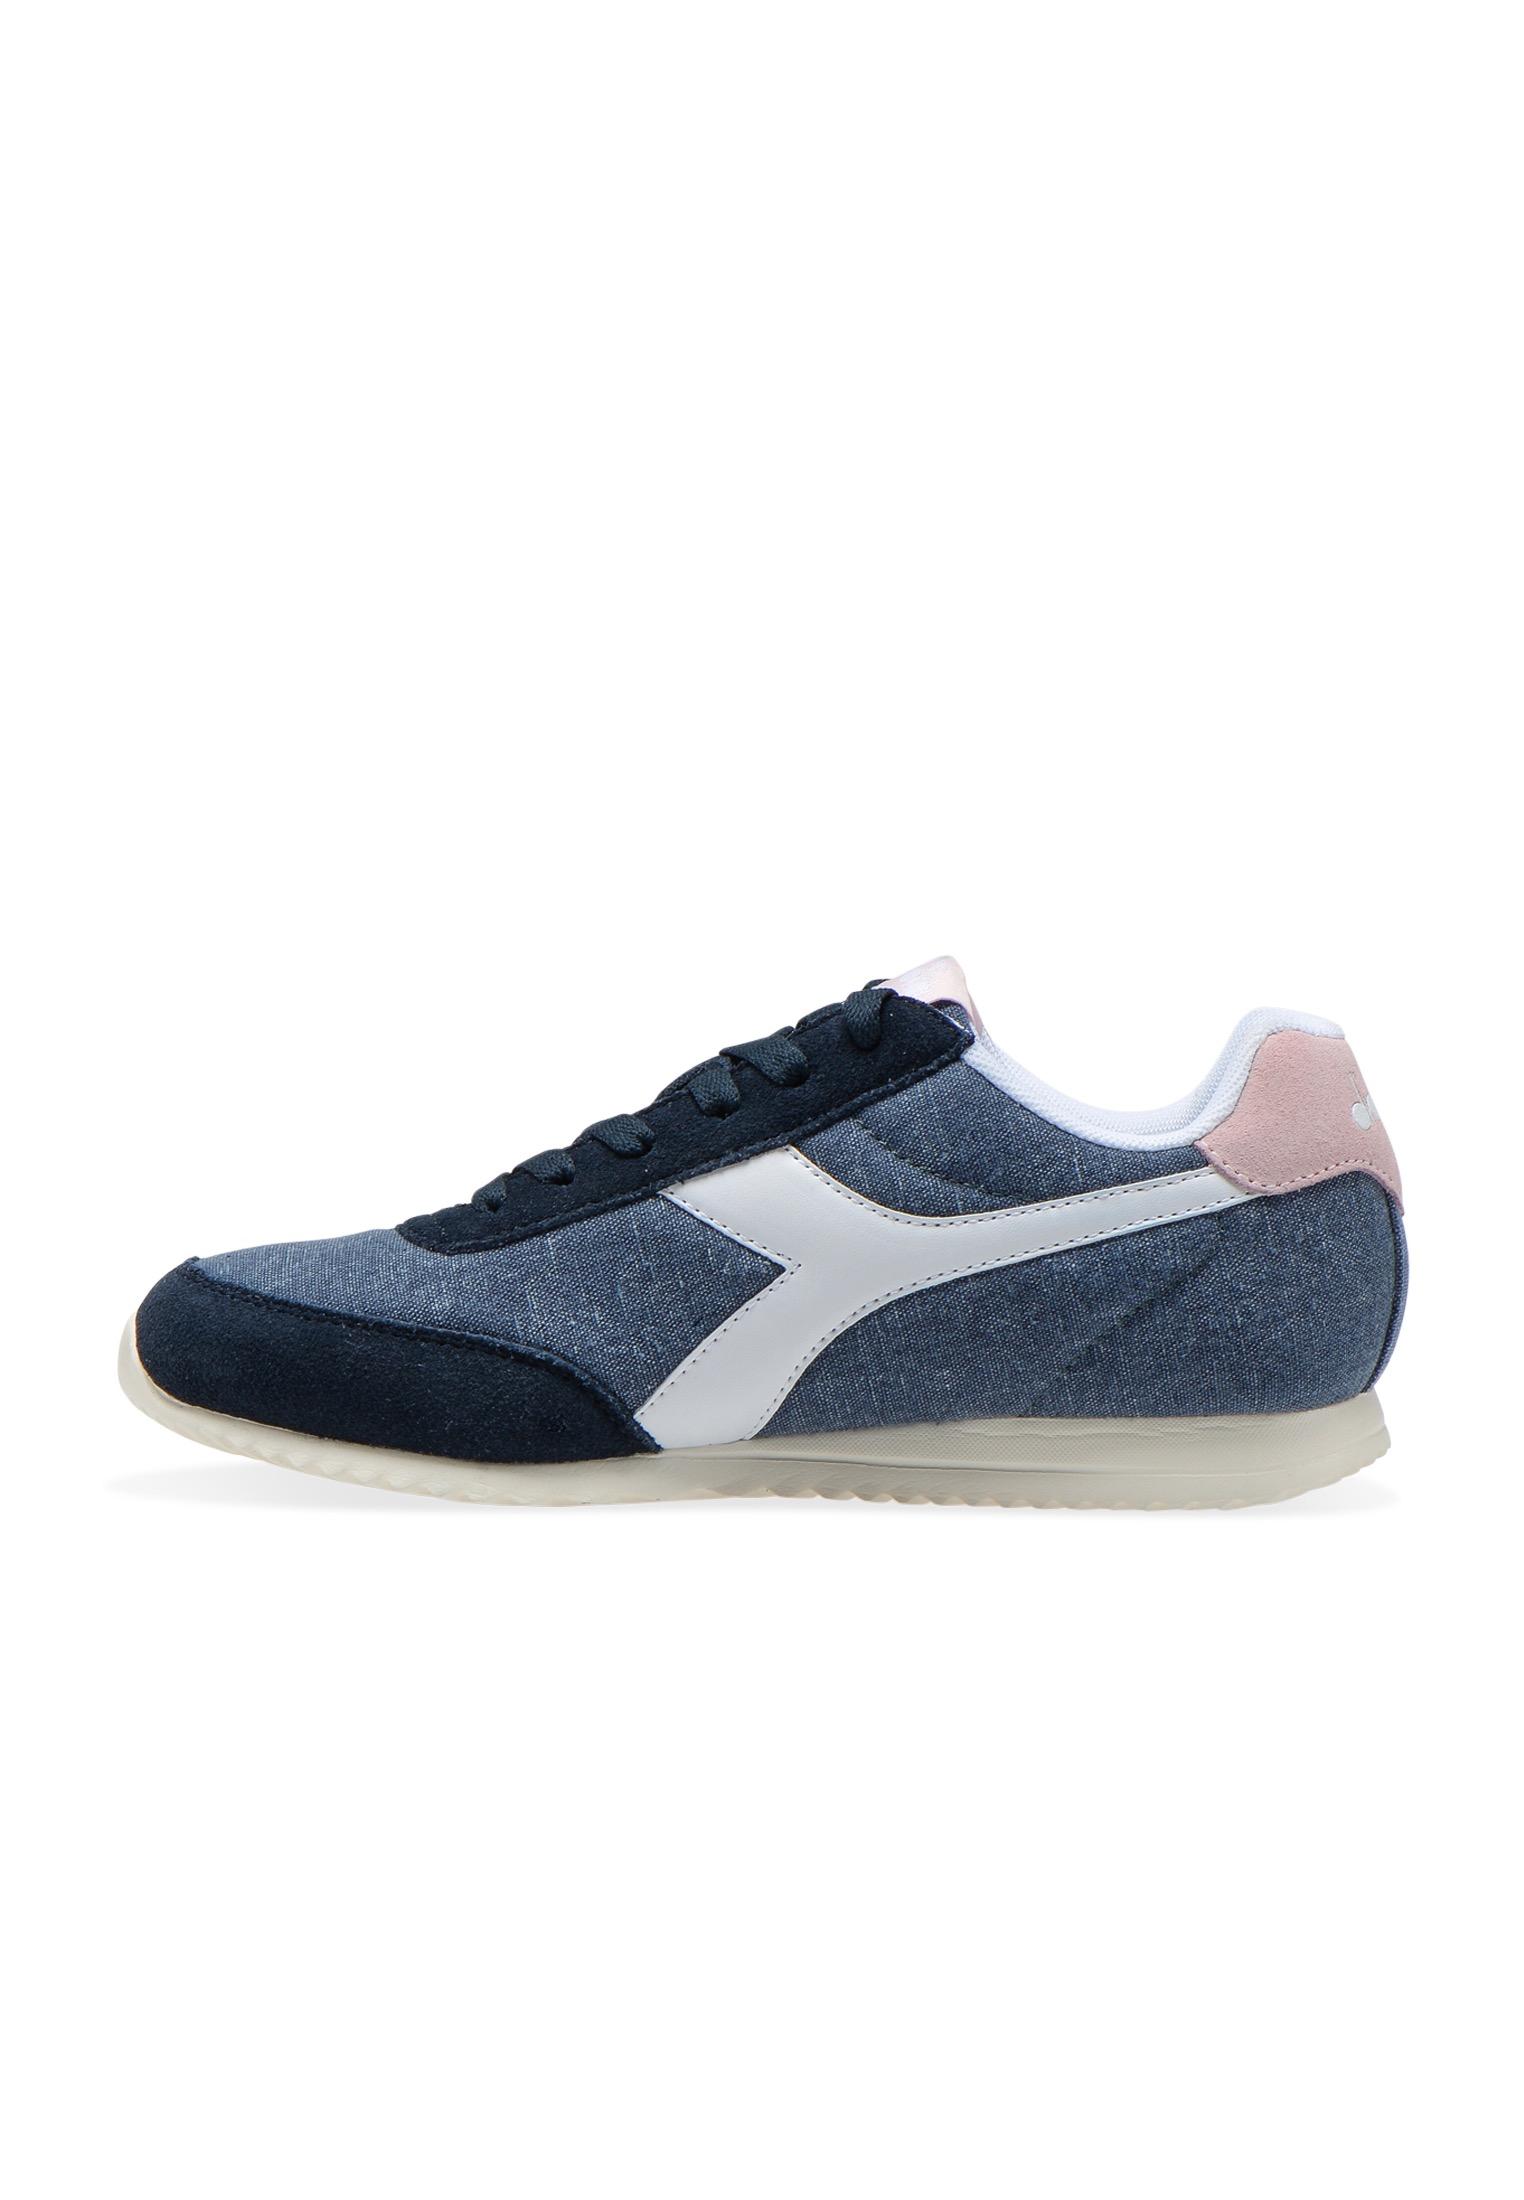 Scarpe-Diadora-Jog-Light-C-Sneakers-sportive-uomo-donna-vari-colori-e-taglie miniatura 51